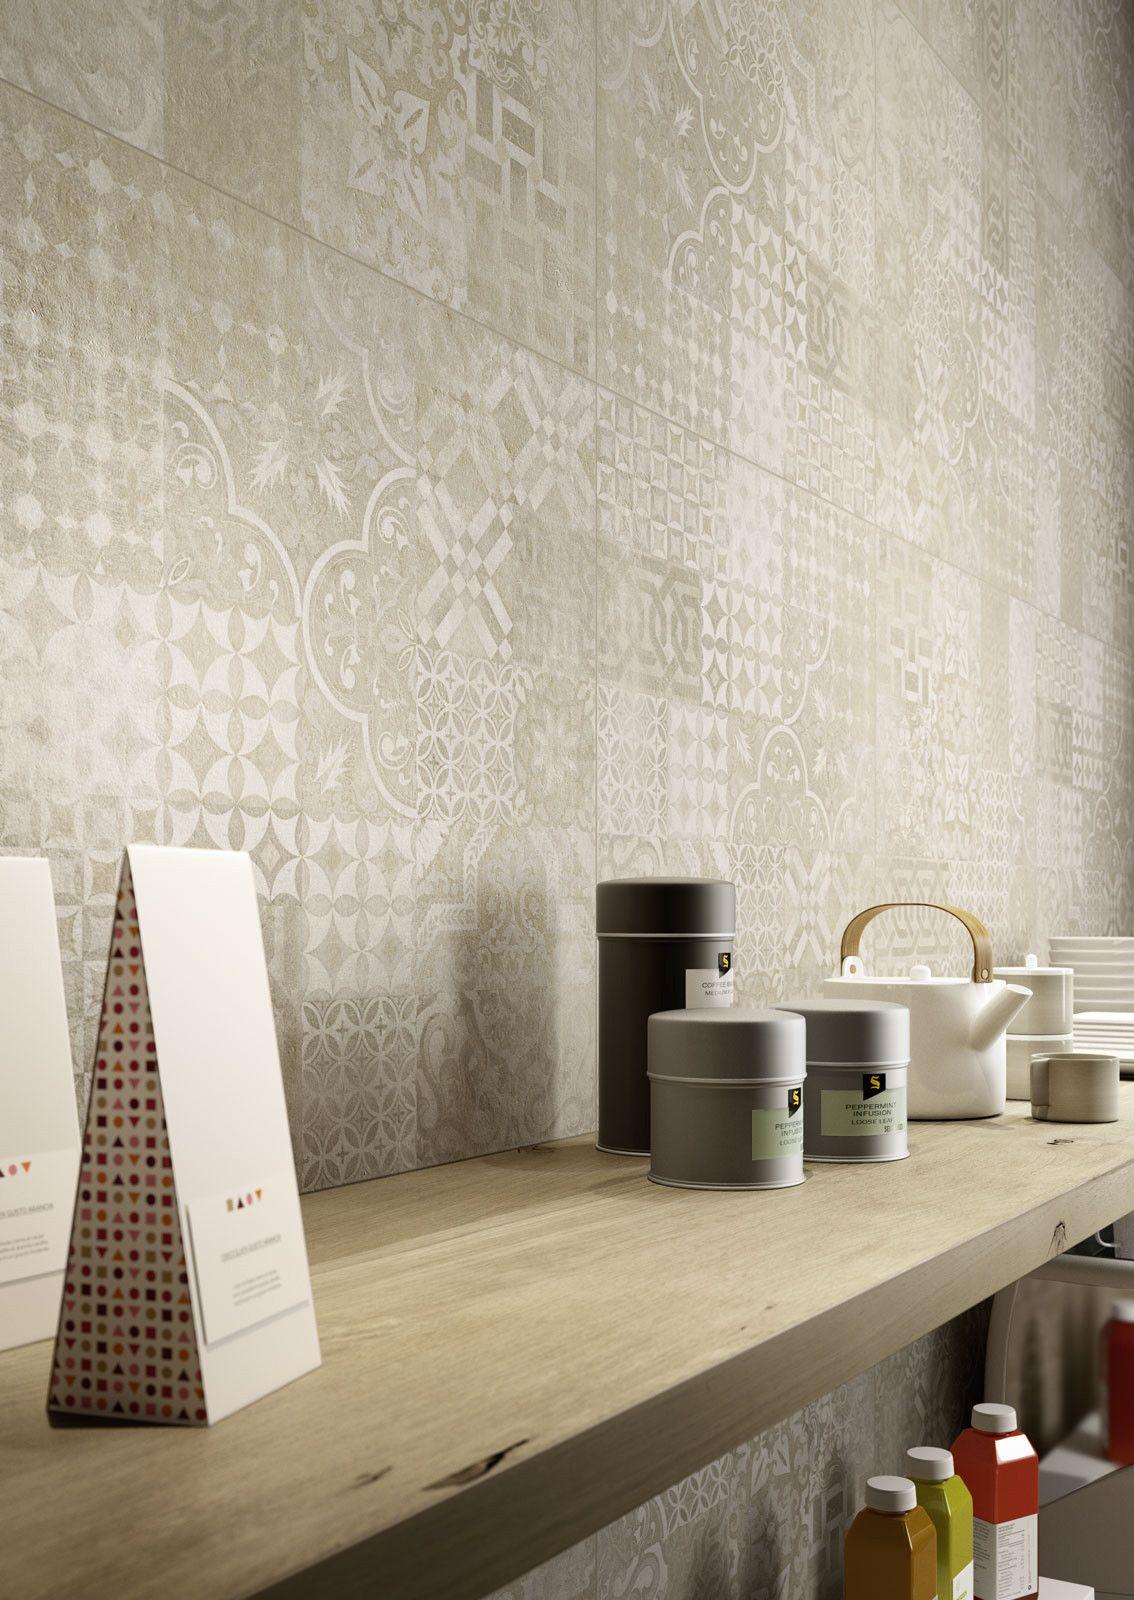 Marazzi #Plaster Dekor 60x60 cm MMG6 | #Feinsteinzeug #Dekore #60x60 ...